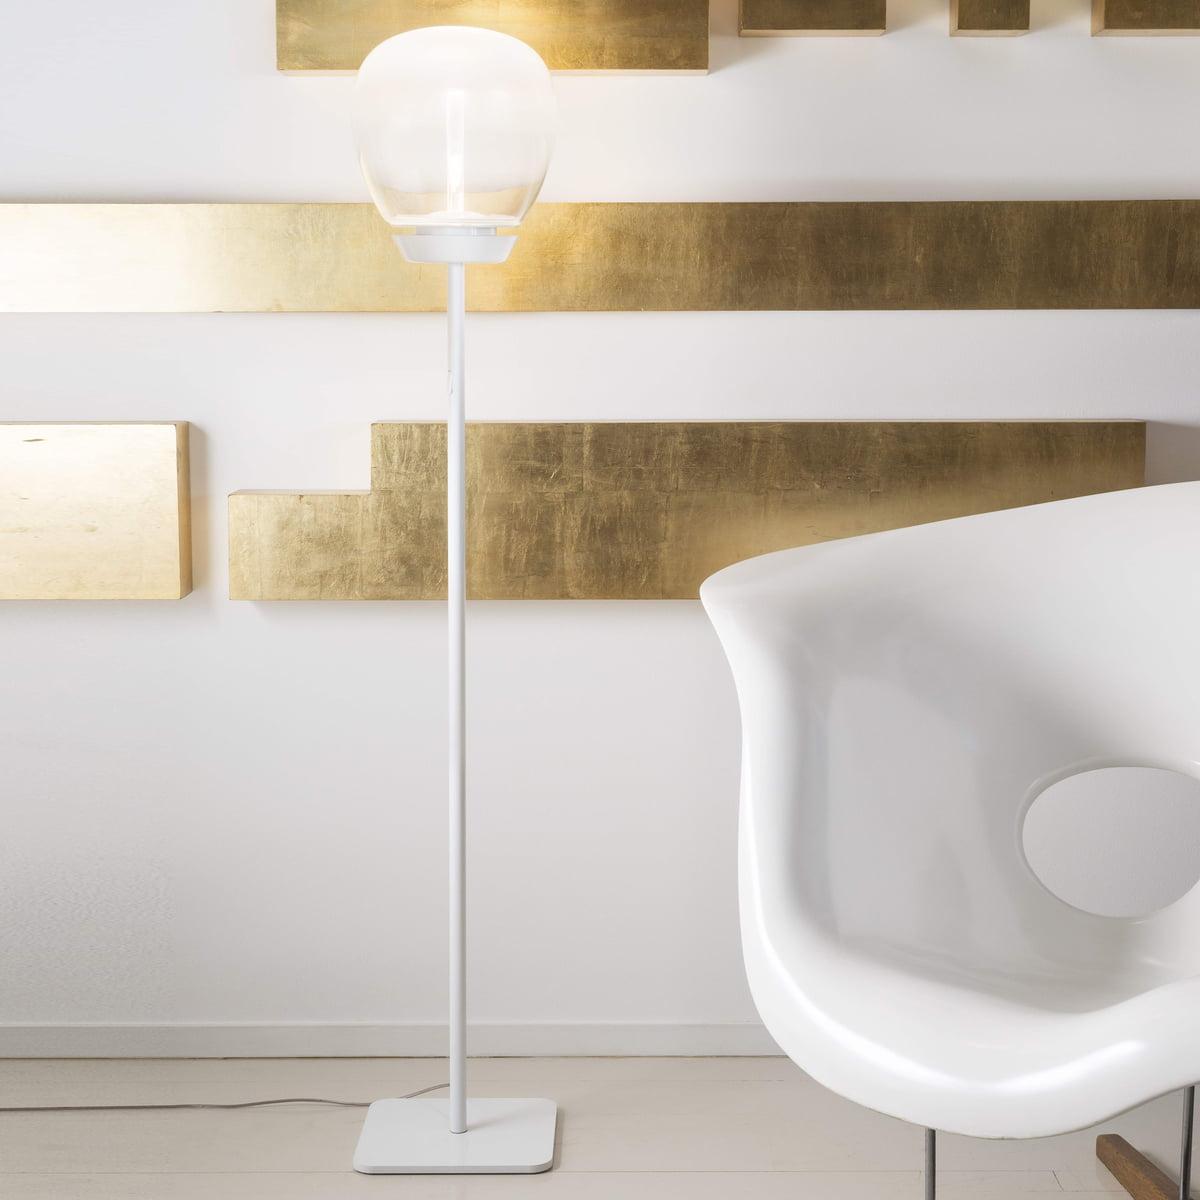 Empatia 26 led floor lamp by artemide artemide empatia 26 terra led floor lamp white aloadofball Images